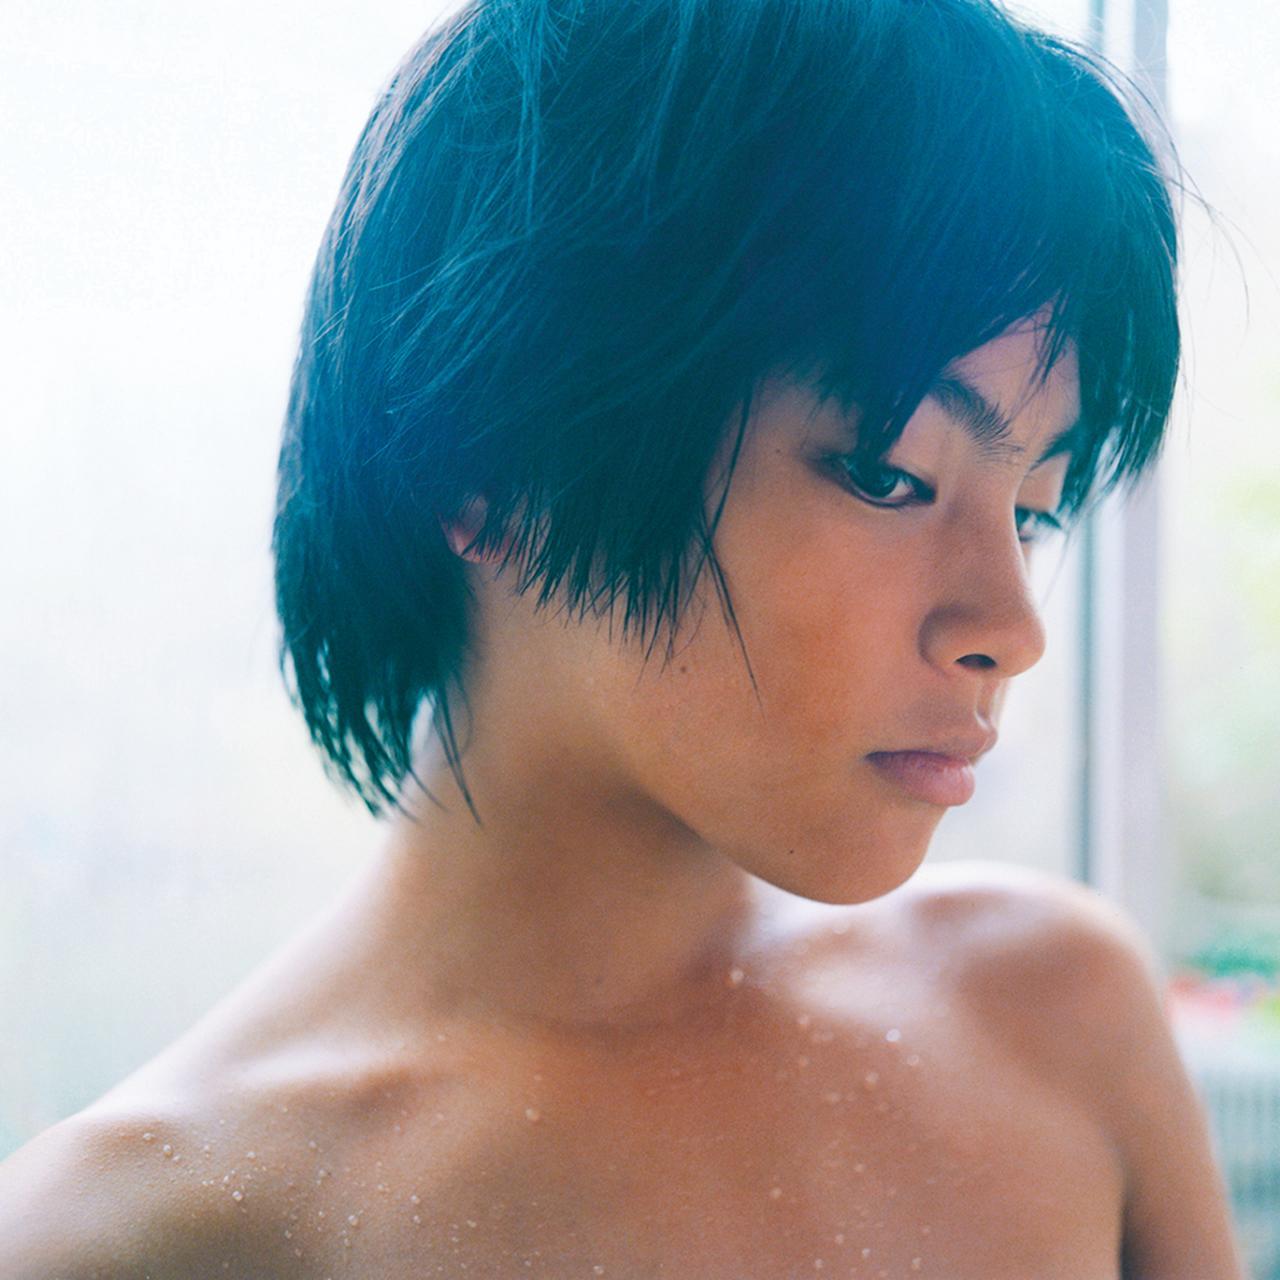 Images : 2番目の画像 - 「見えざる人々を見る。 映画監督・是枝裕和インタビュー」のアルバム - T JAPAN:The New York Times Style Magazine 公式サイト